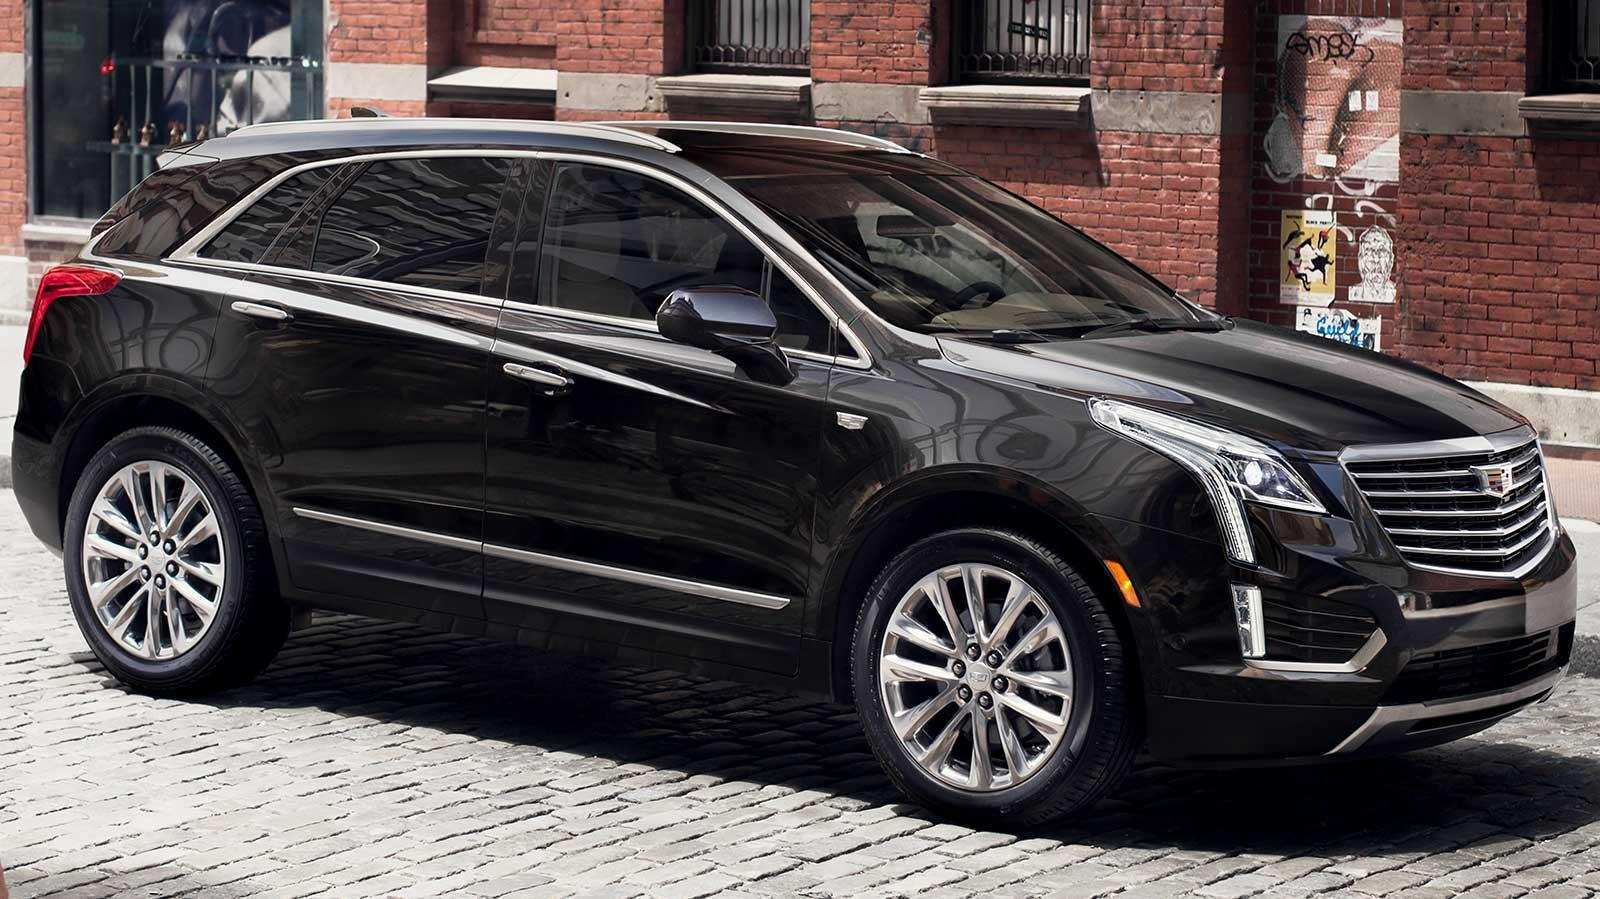 92 Great 2019 Cadillac Suv Xt5 Release by 2019 Cadillac Suv Xt5